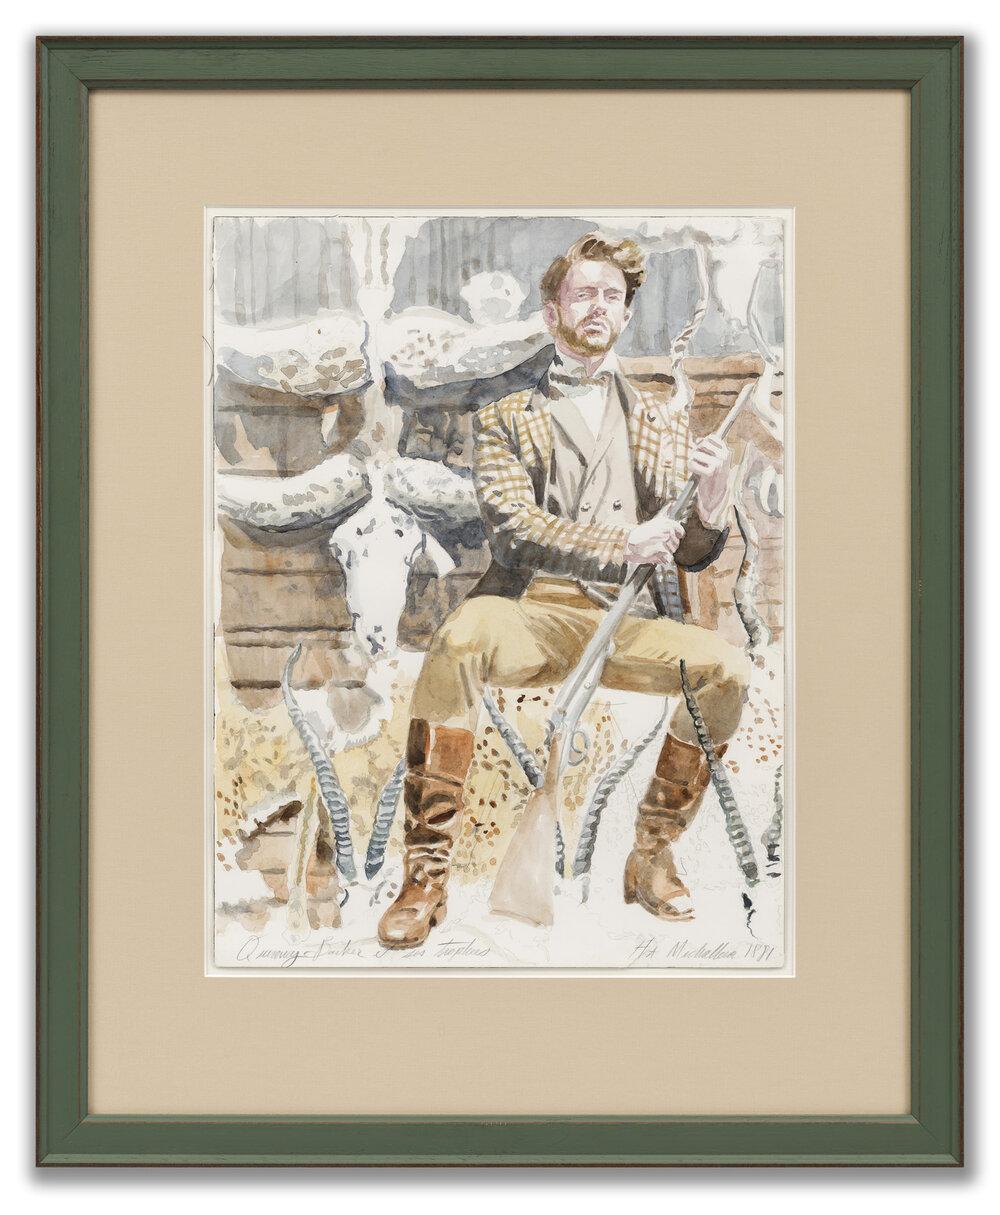 Hippolyte-Alexandre Michallon (1849-1930) aka Mark Beard (American b.1956), Quincy Barker et ses Trophées.